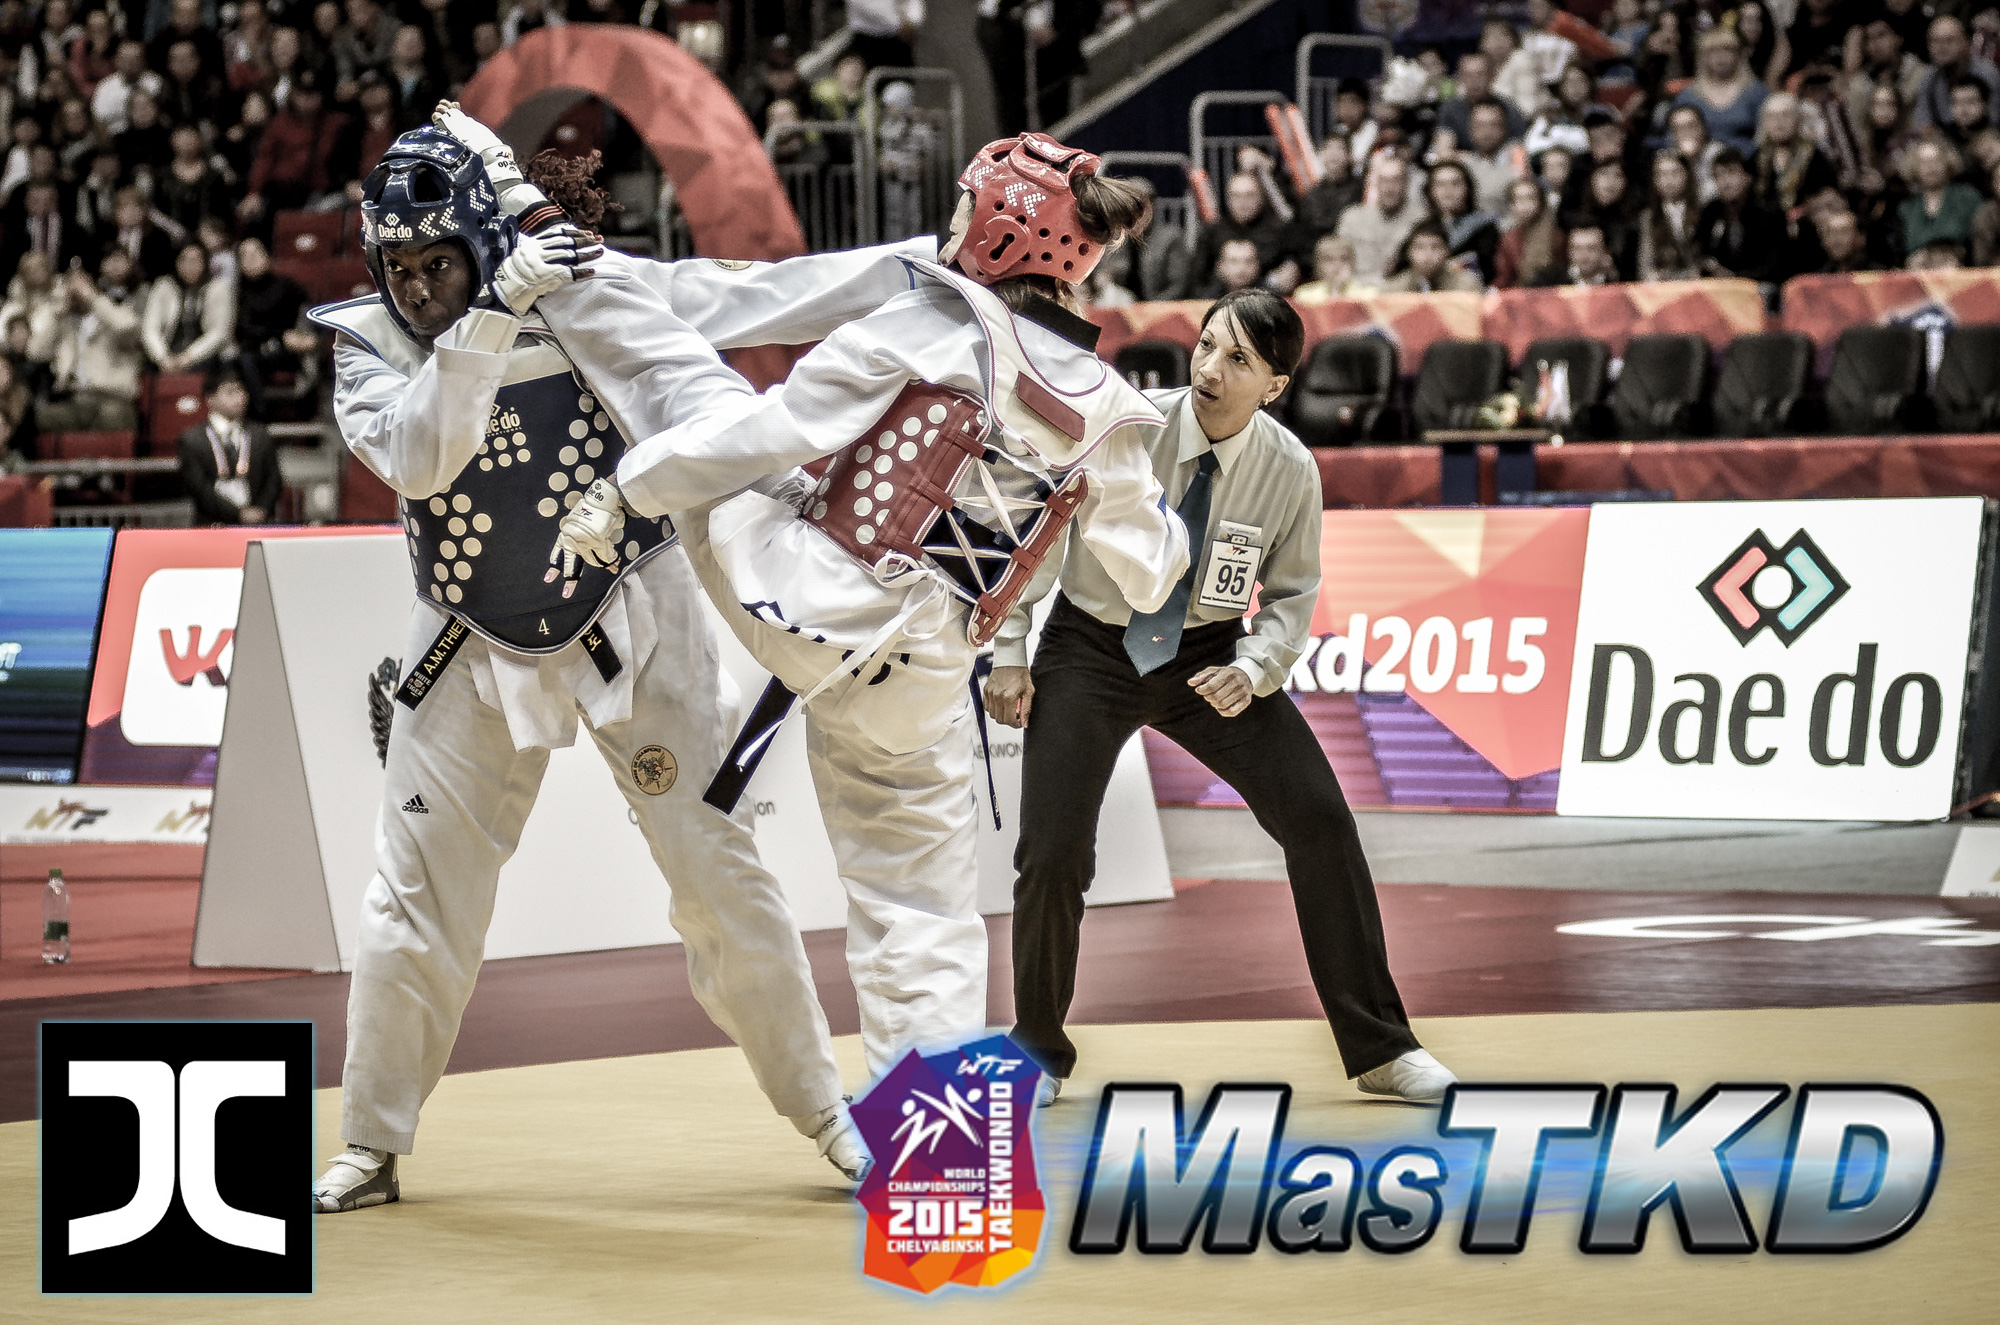 10_JCalicu-Mejores-imagenes-del-Mundial-de-Taekwondo_d5